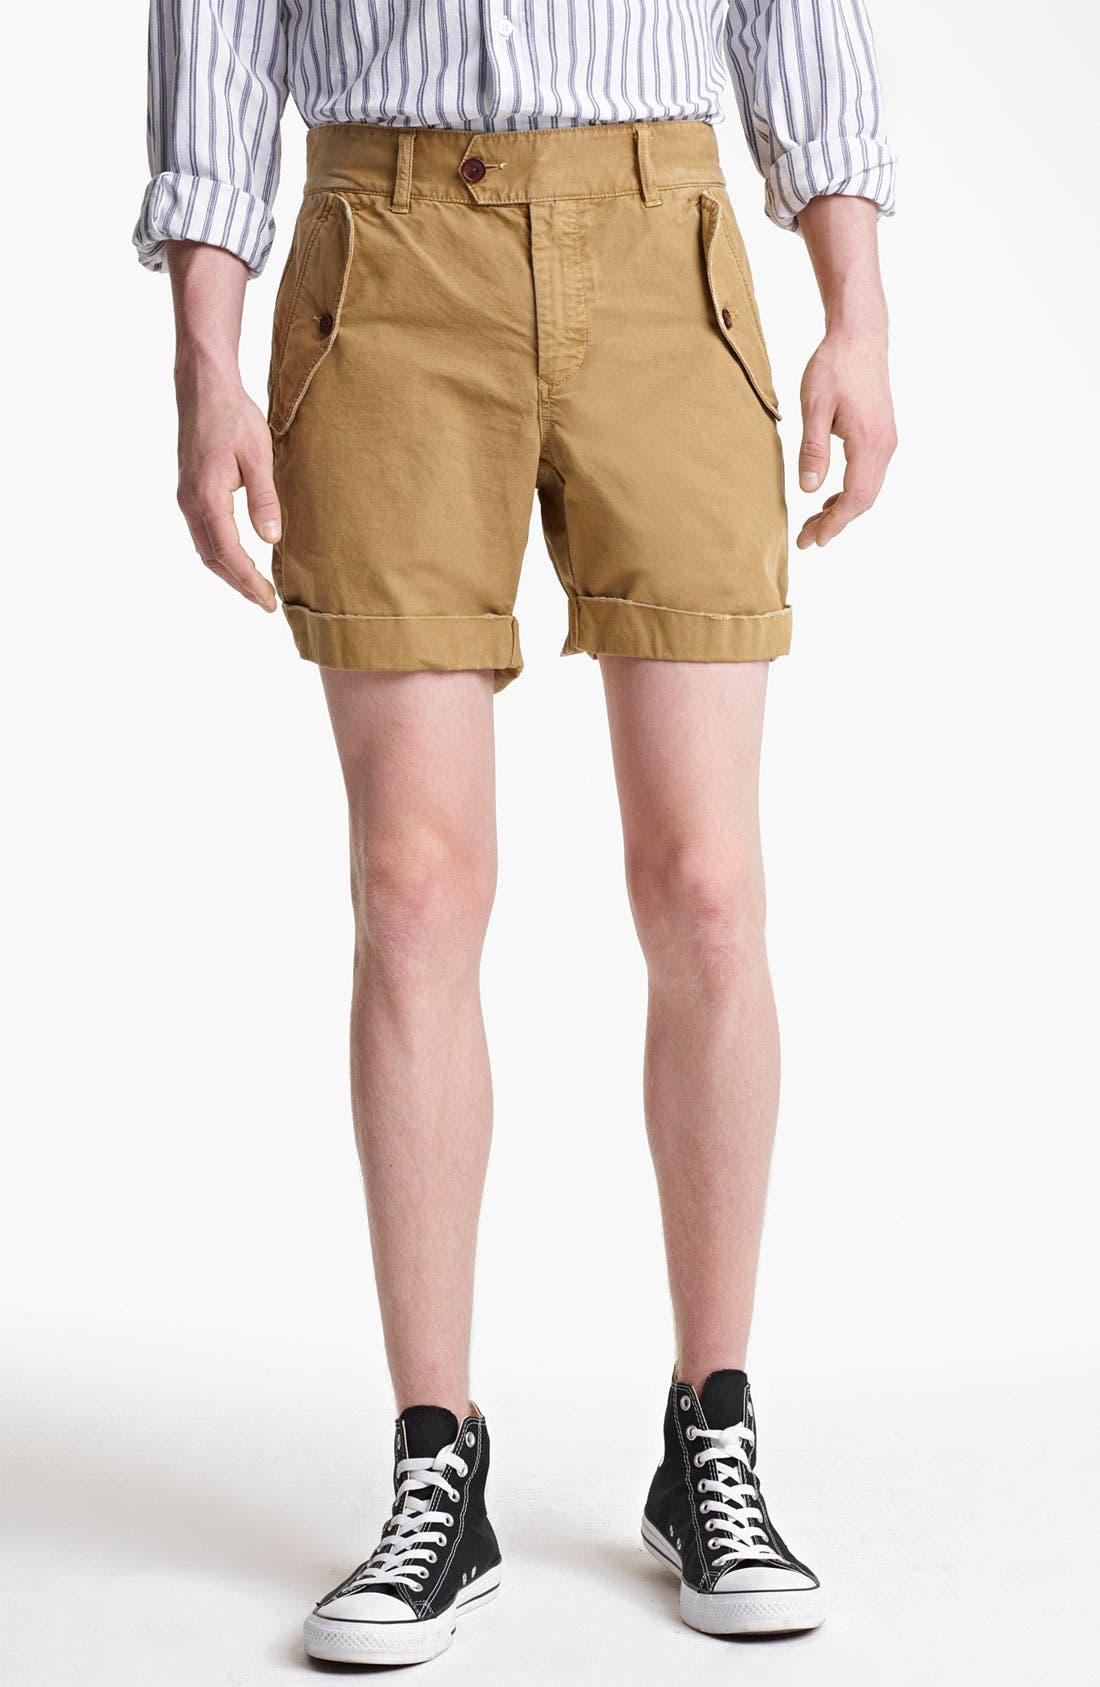 Alternate Image 1 Selected - Gant by Michael Bastian Military Shorts